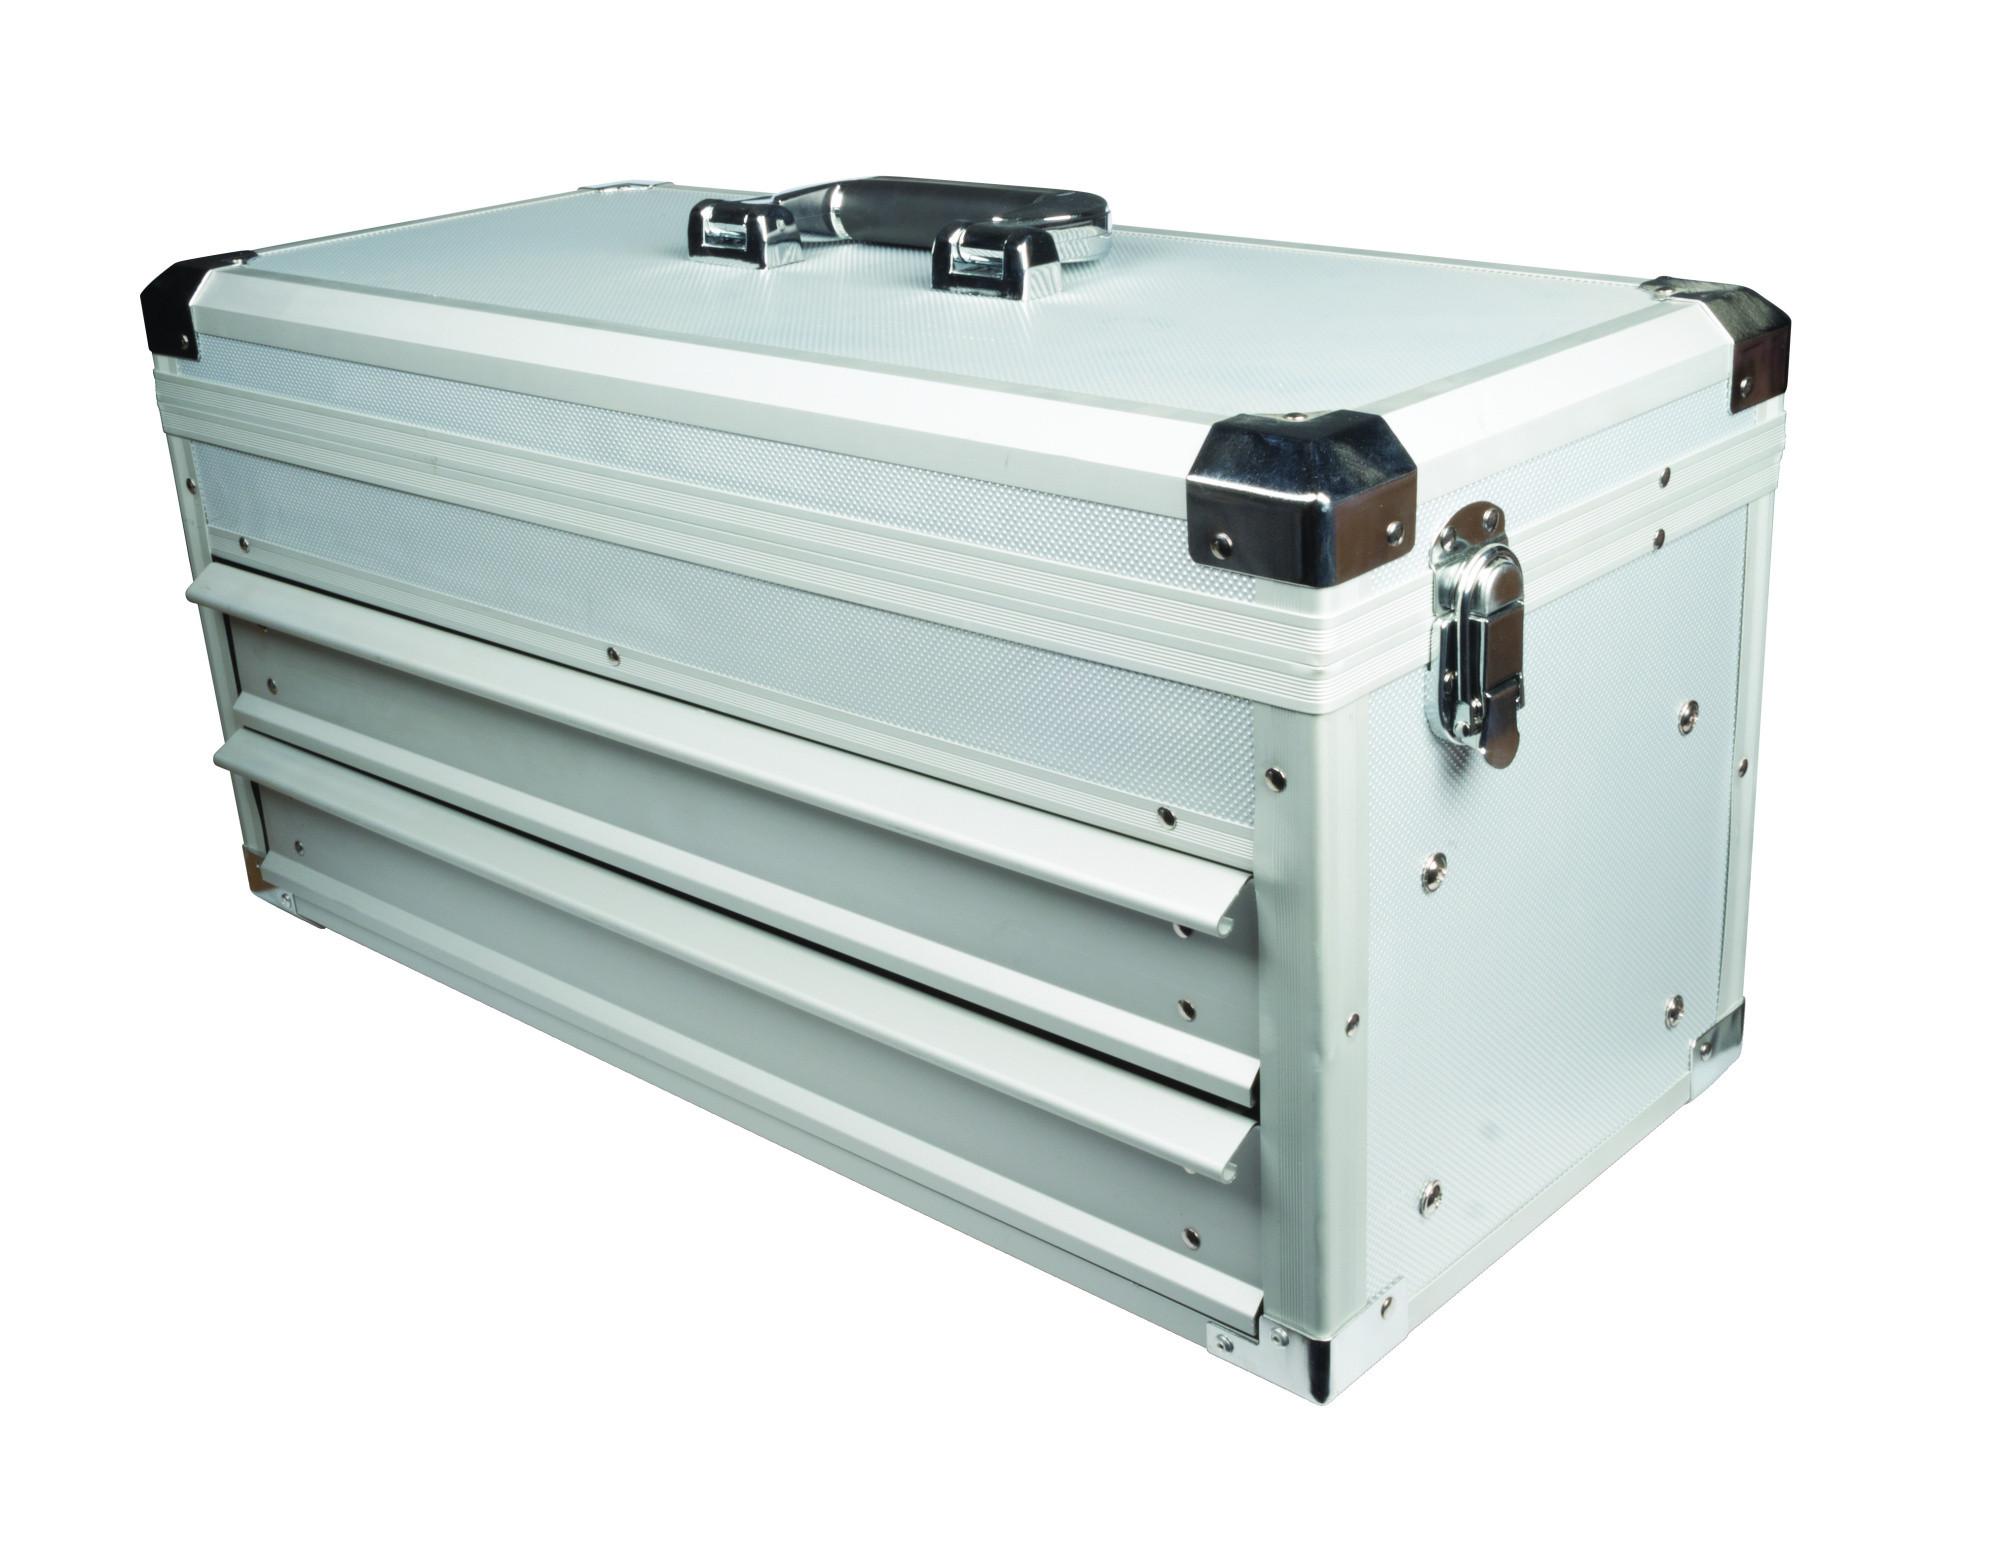 maplin aluminium tool box 2 sliding drawers case storage toolbox tools lockable ebay. Black Bedroom Furniture Sets. Home Design Ideas